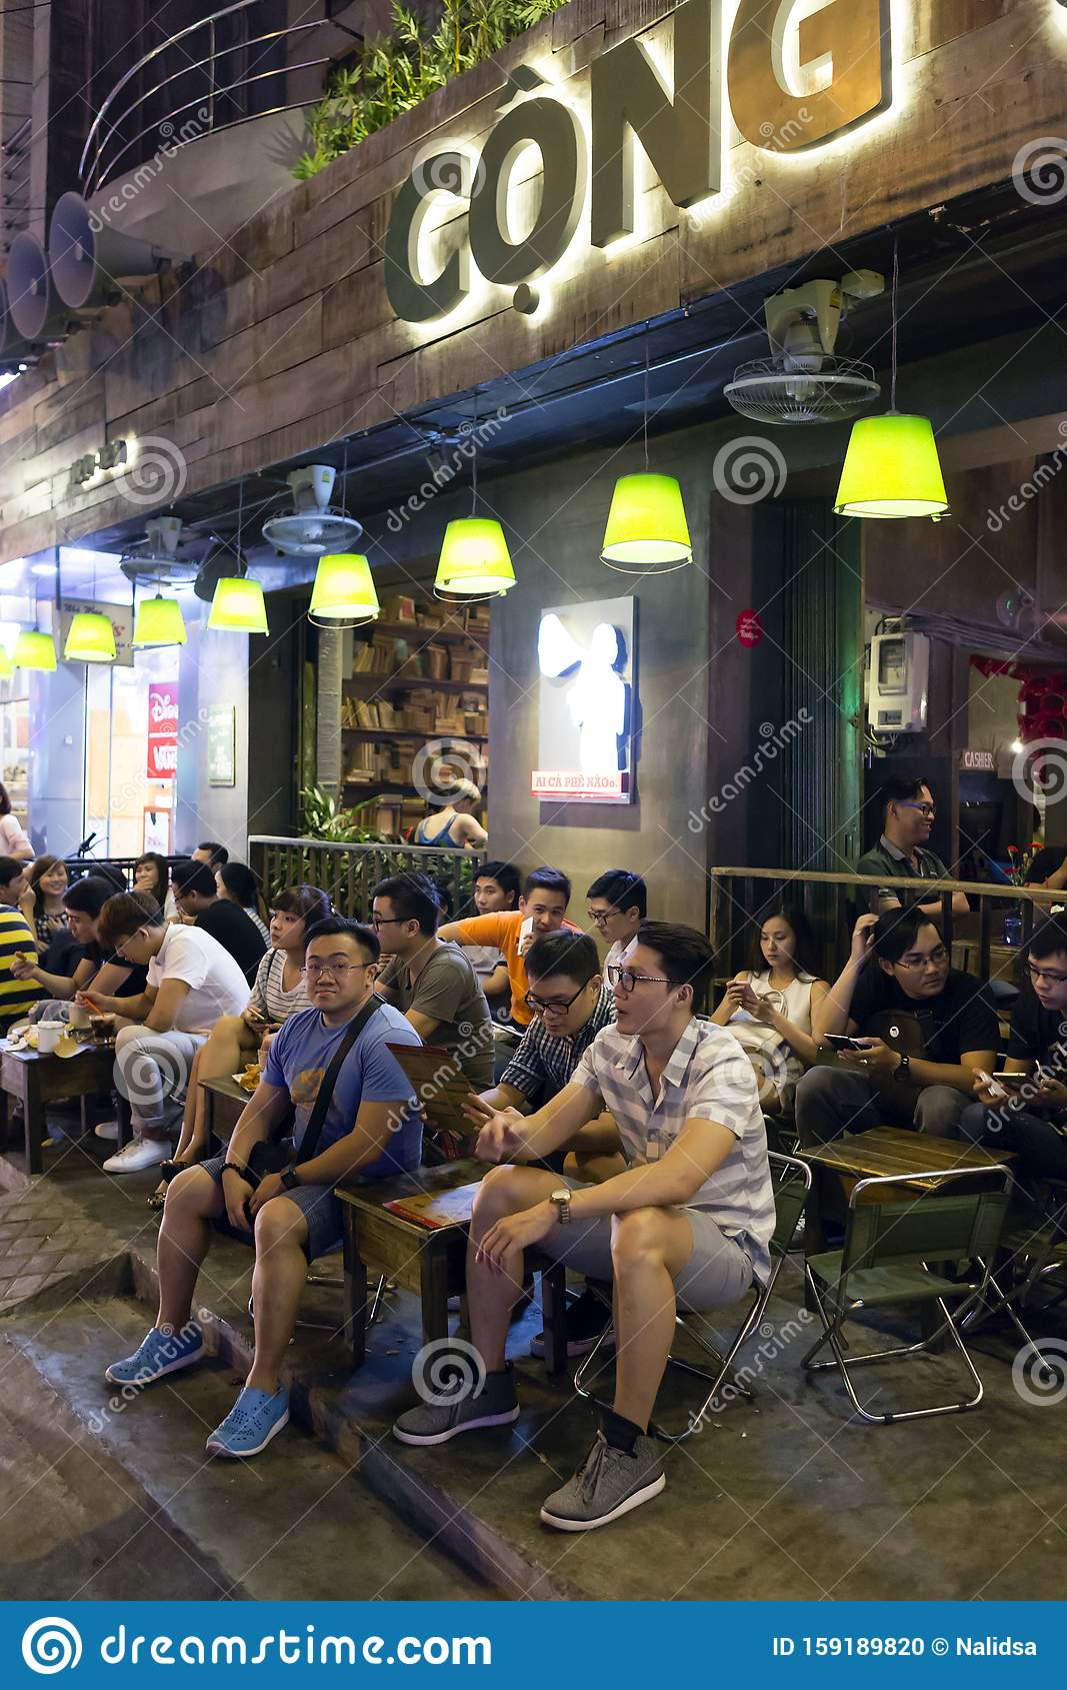 Ho Chi Minh City Vietnam Nightlife Editorial Image Image Of Night Clubbing 159189820